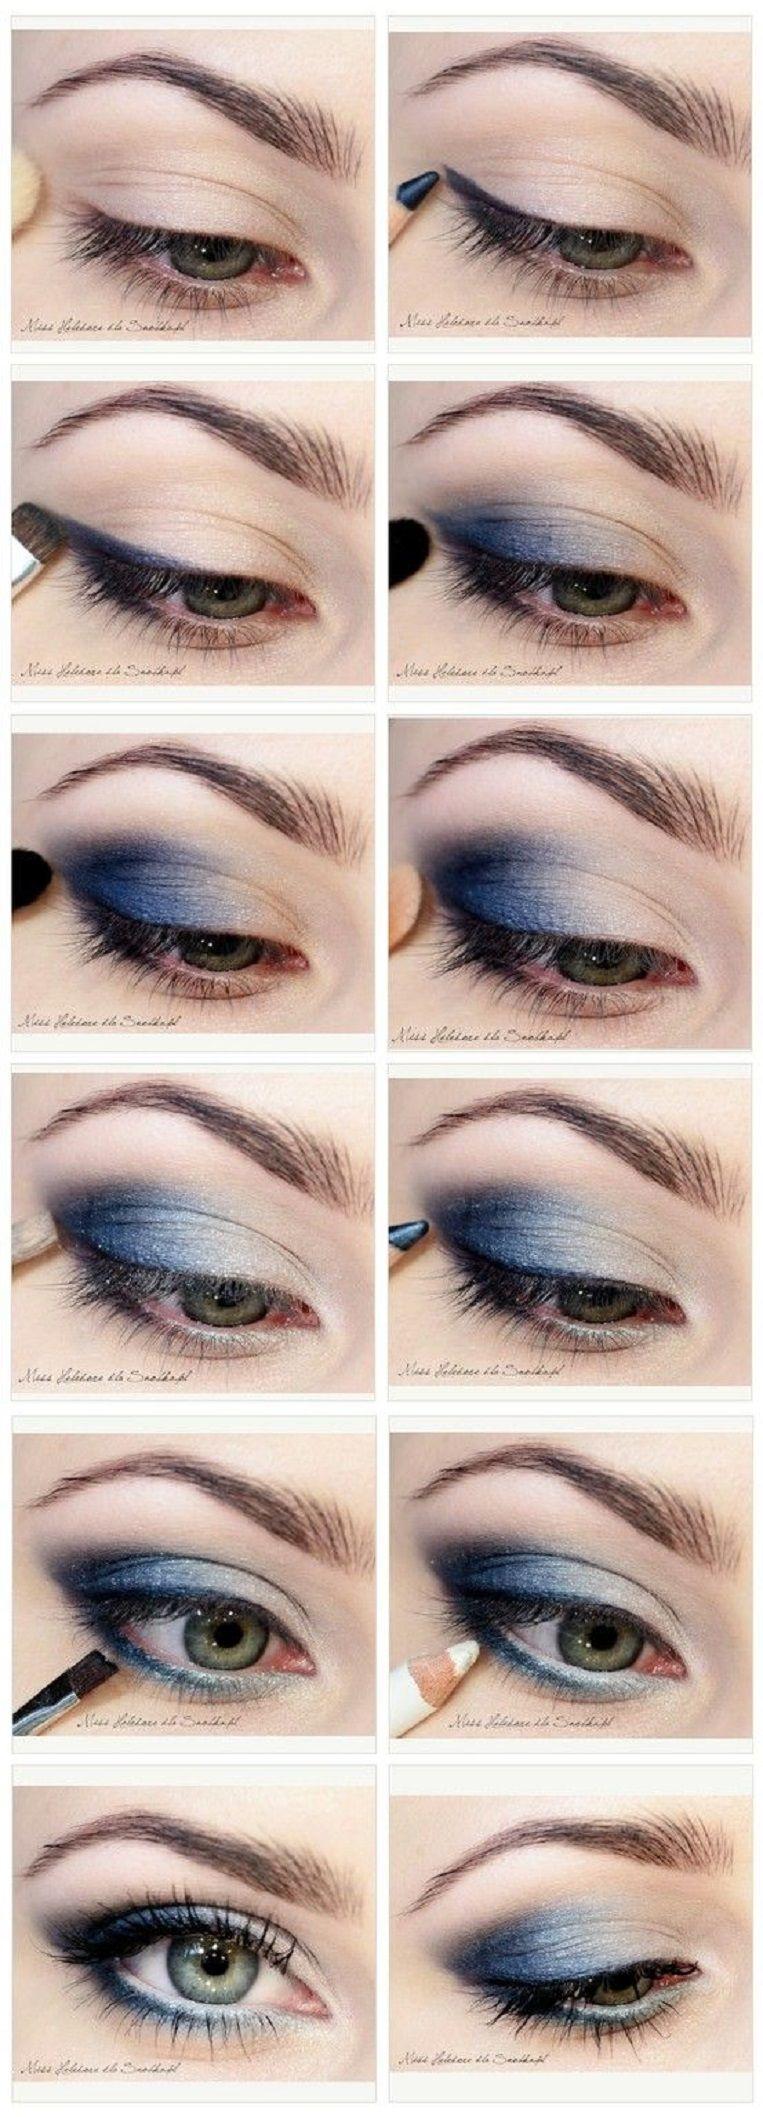 Metallic Blue Eye Makeup Tutorial My Style In 2018 Pinterest